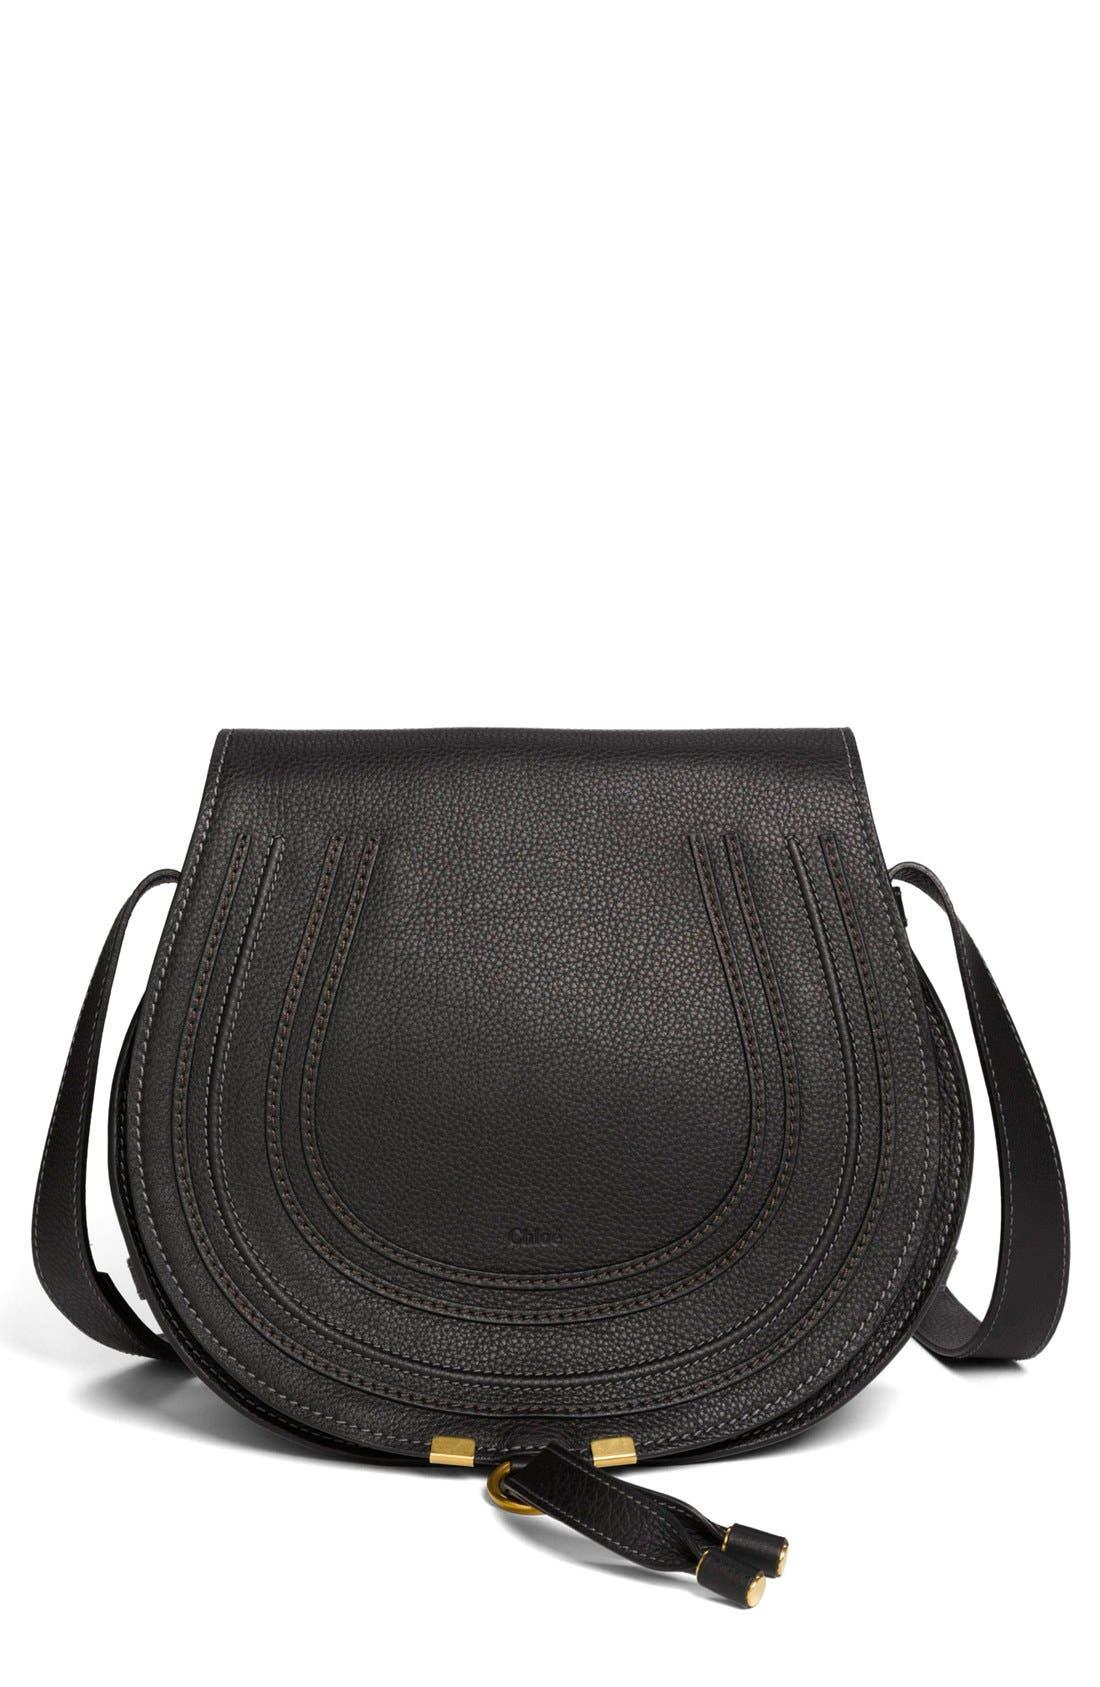 'Marcie - Medium' Leather Crossbody Bag,                             Main thumbnail 1, color,                             001